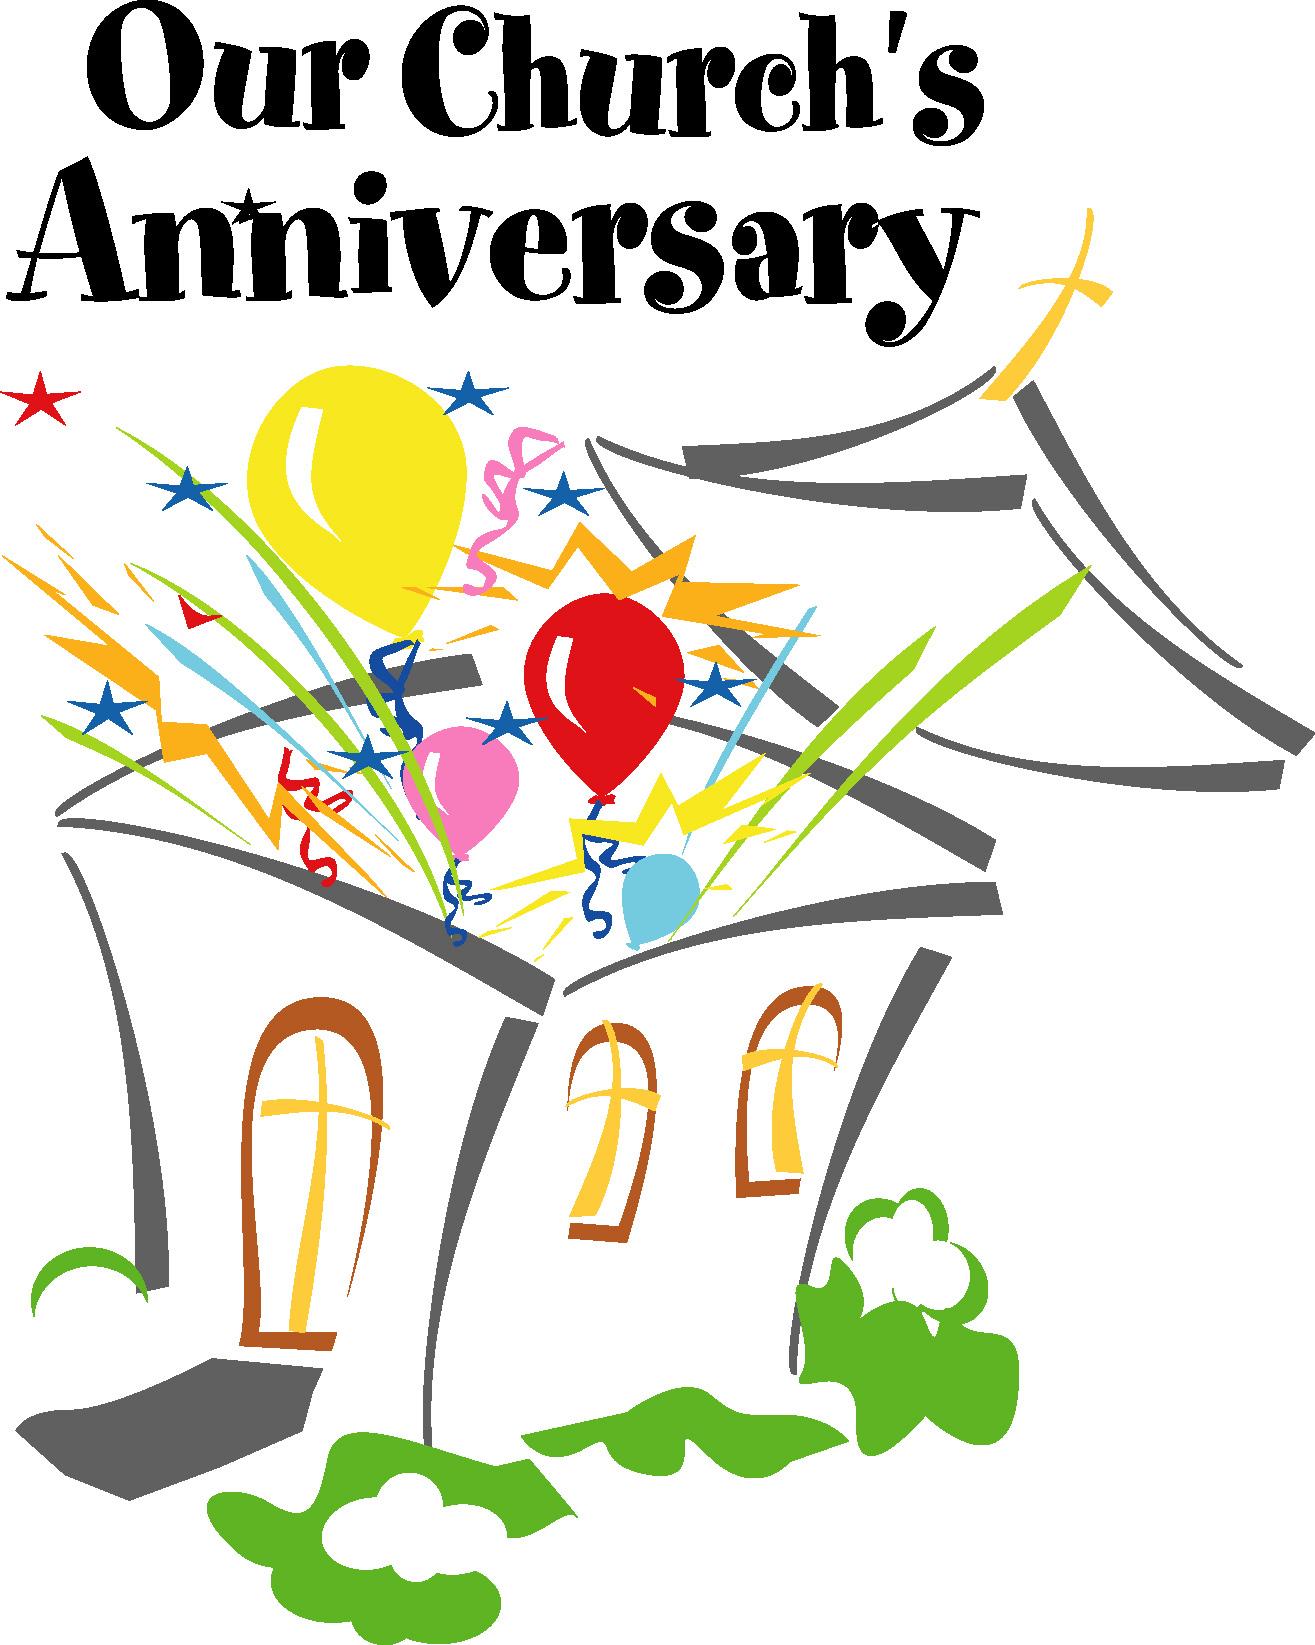 St Godwald S Church 130 Th Anniversary W-St Godwald S Church 130 Th Anniversary Weekend Of 7 Th 8 Th June-18